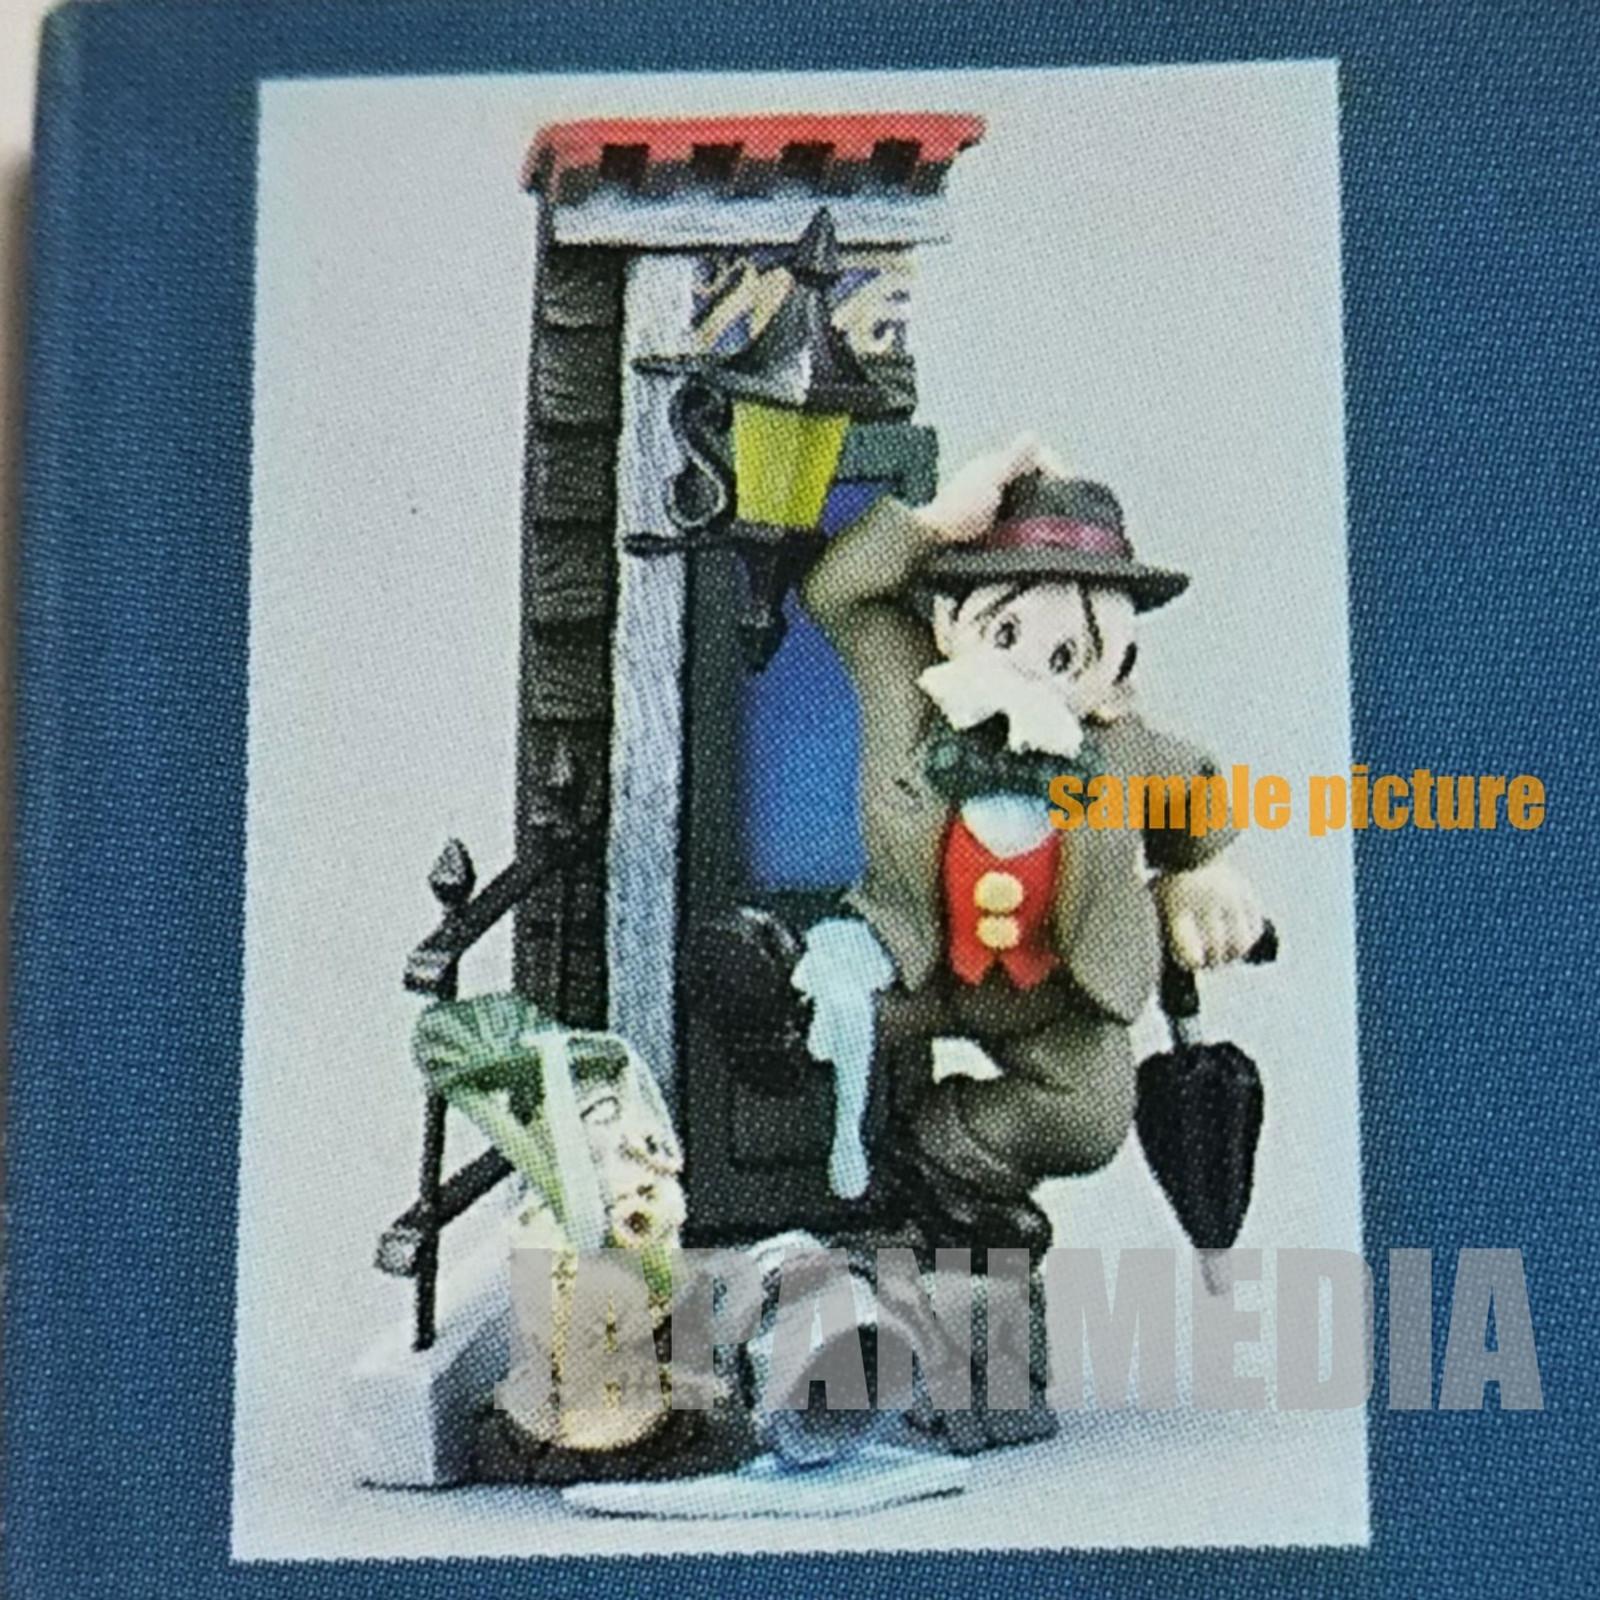 Astro Boy Higeoyaji Mini Vignette Diorama Figure JAPAN ANIME MANGA